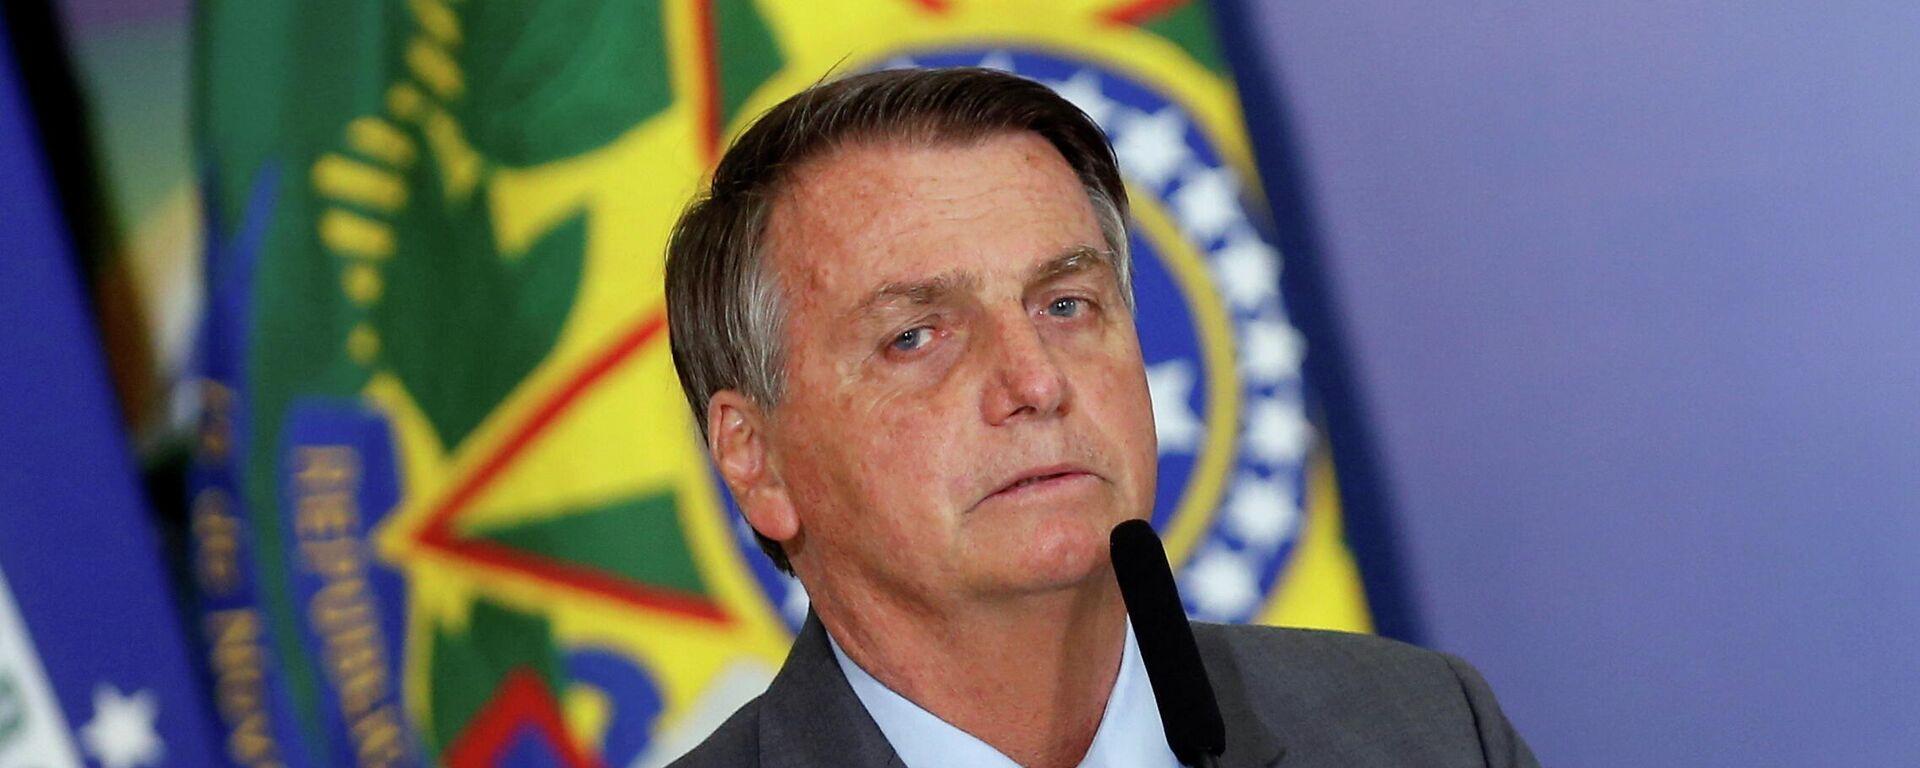 Jair Bolsonaro, presidente de Brasil - Sputnik Mundo, 1920, 19.08.2021